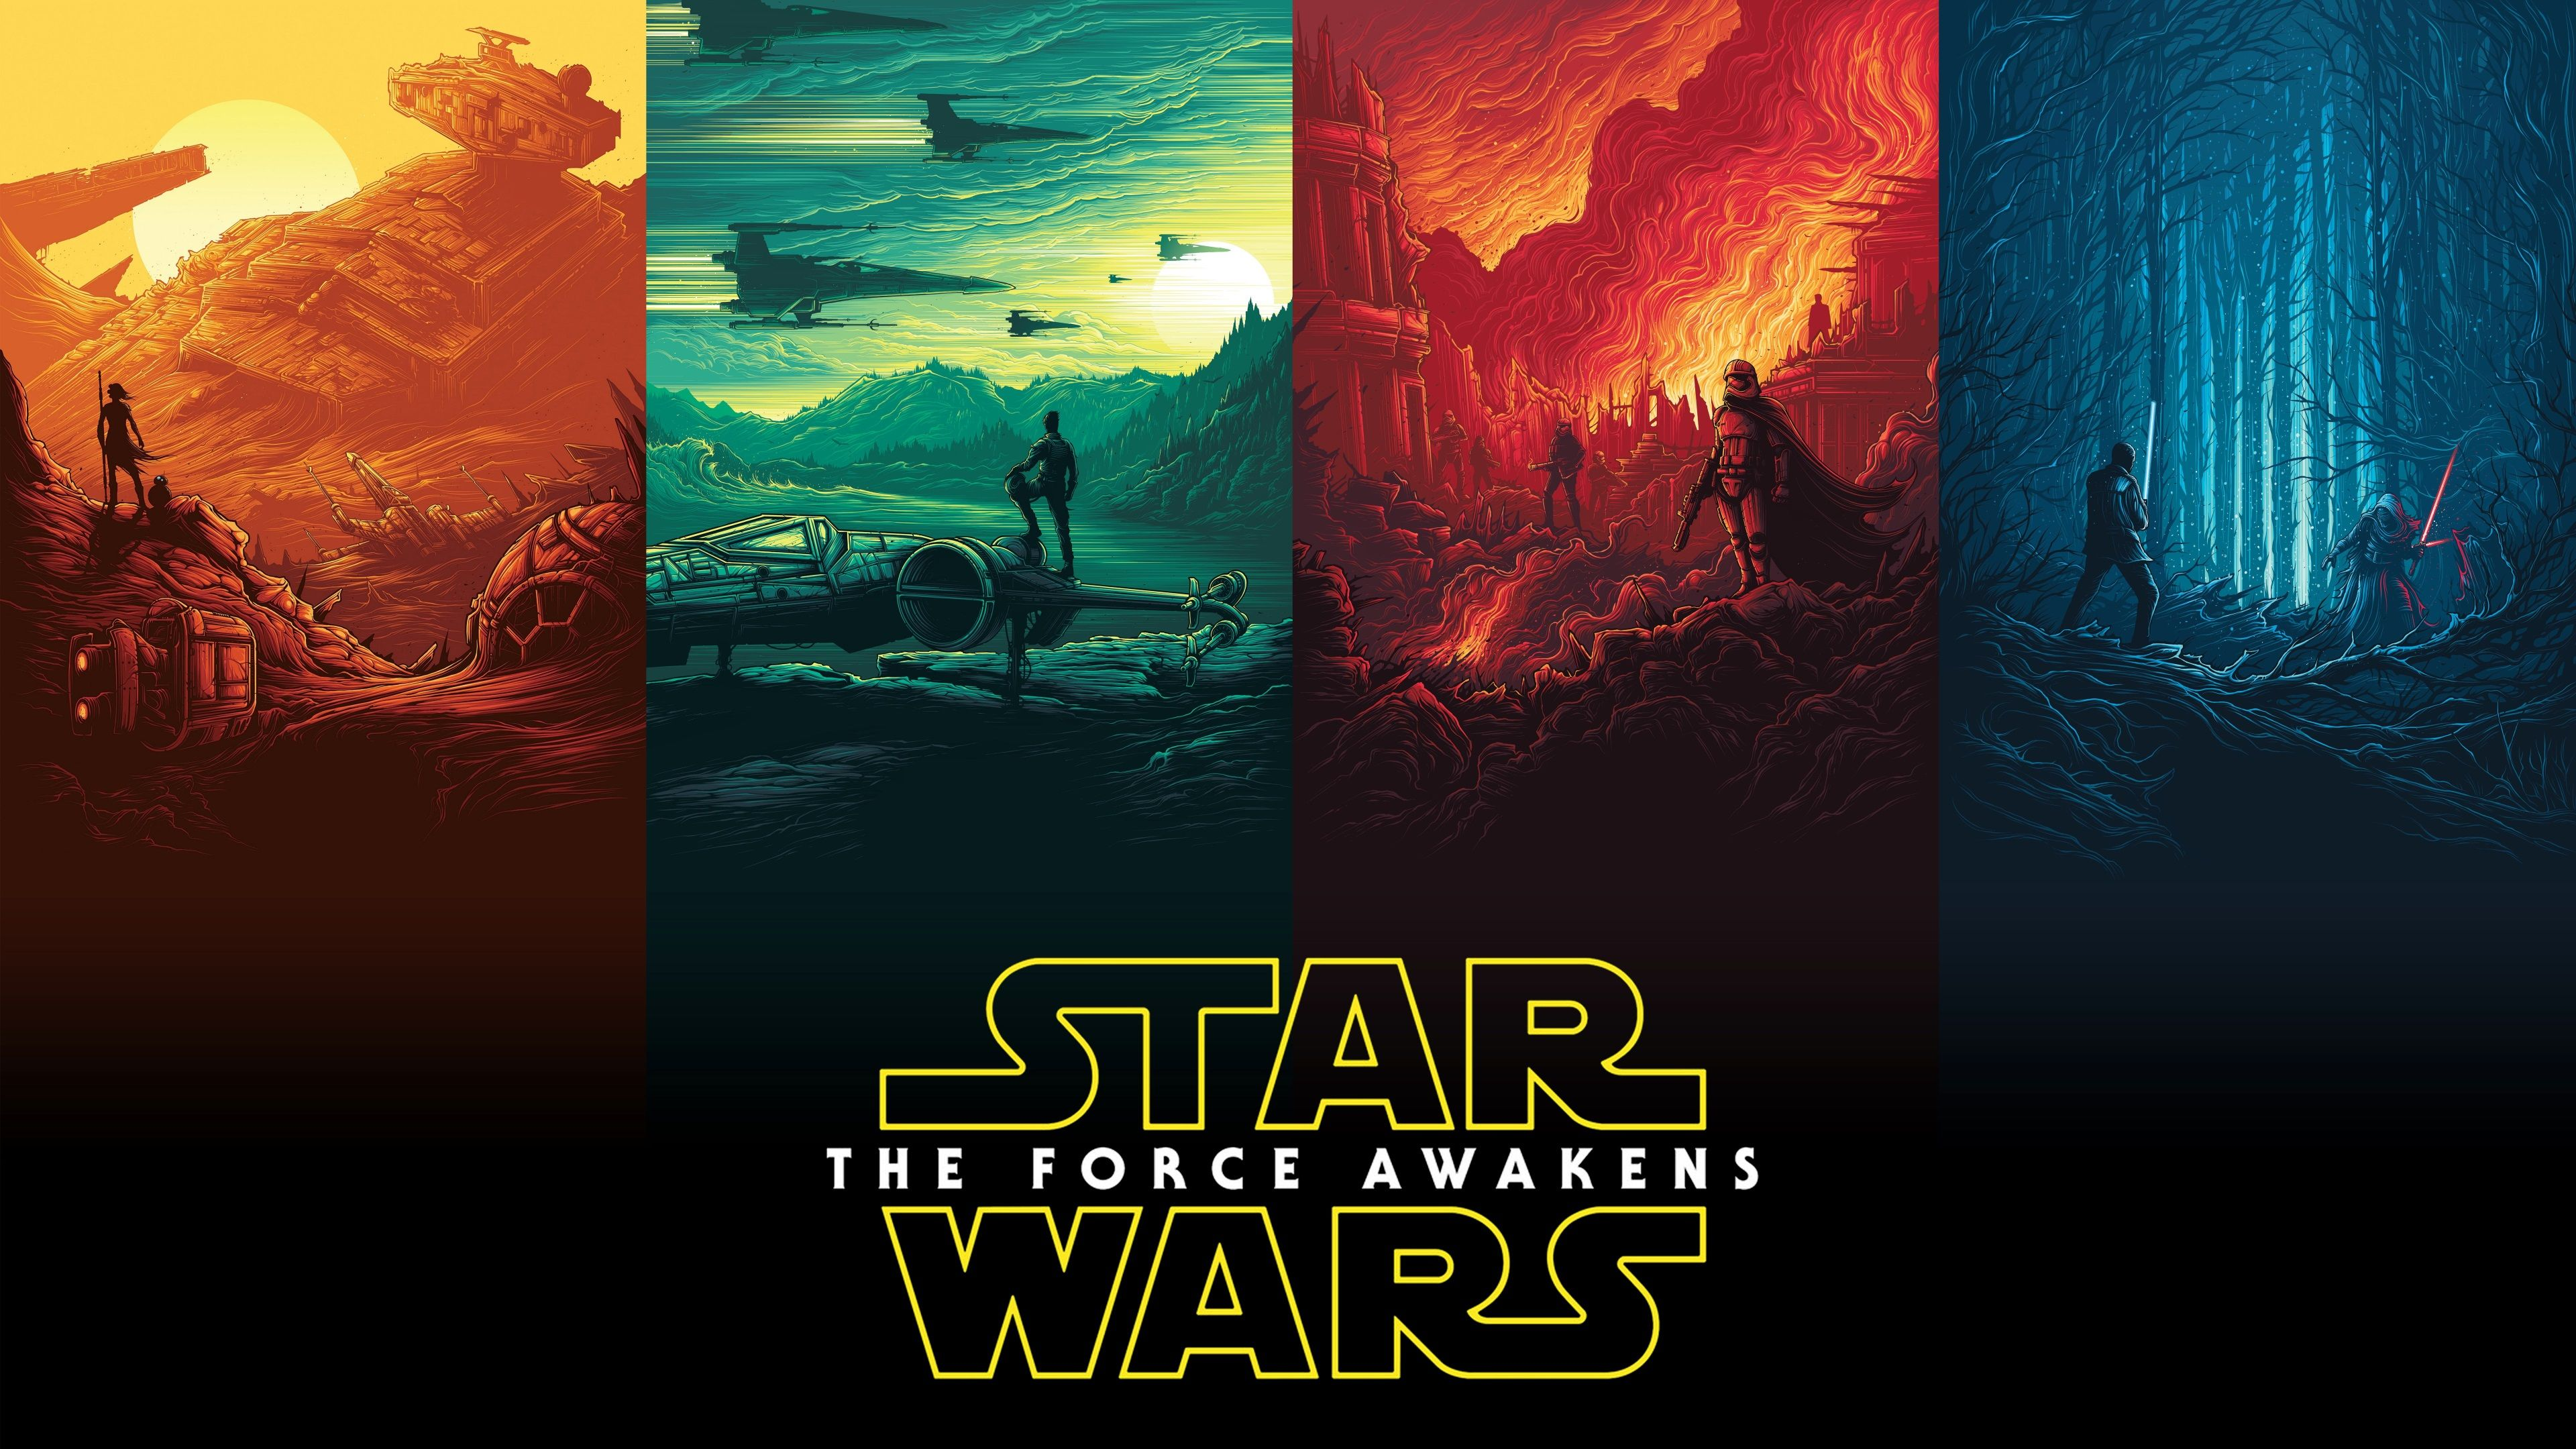 Free Download 3840x2160 Star Wars 4k Ultra High Definition Wallpaper Star Wars 3840x2160 For Your Desktop Mobile Tablet Explore 20 Star Wars 4k Wallpapers Star Wars 4k Wallpaper 4k